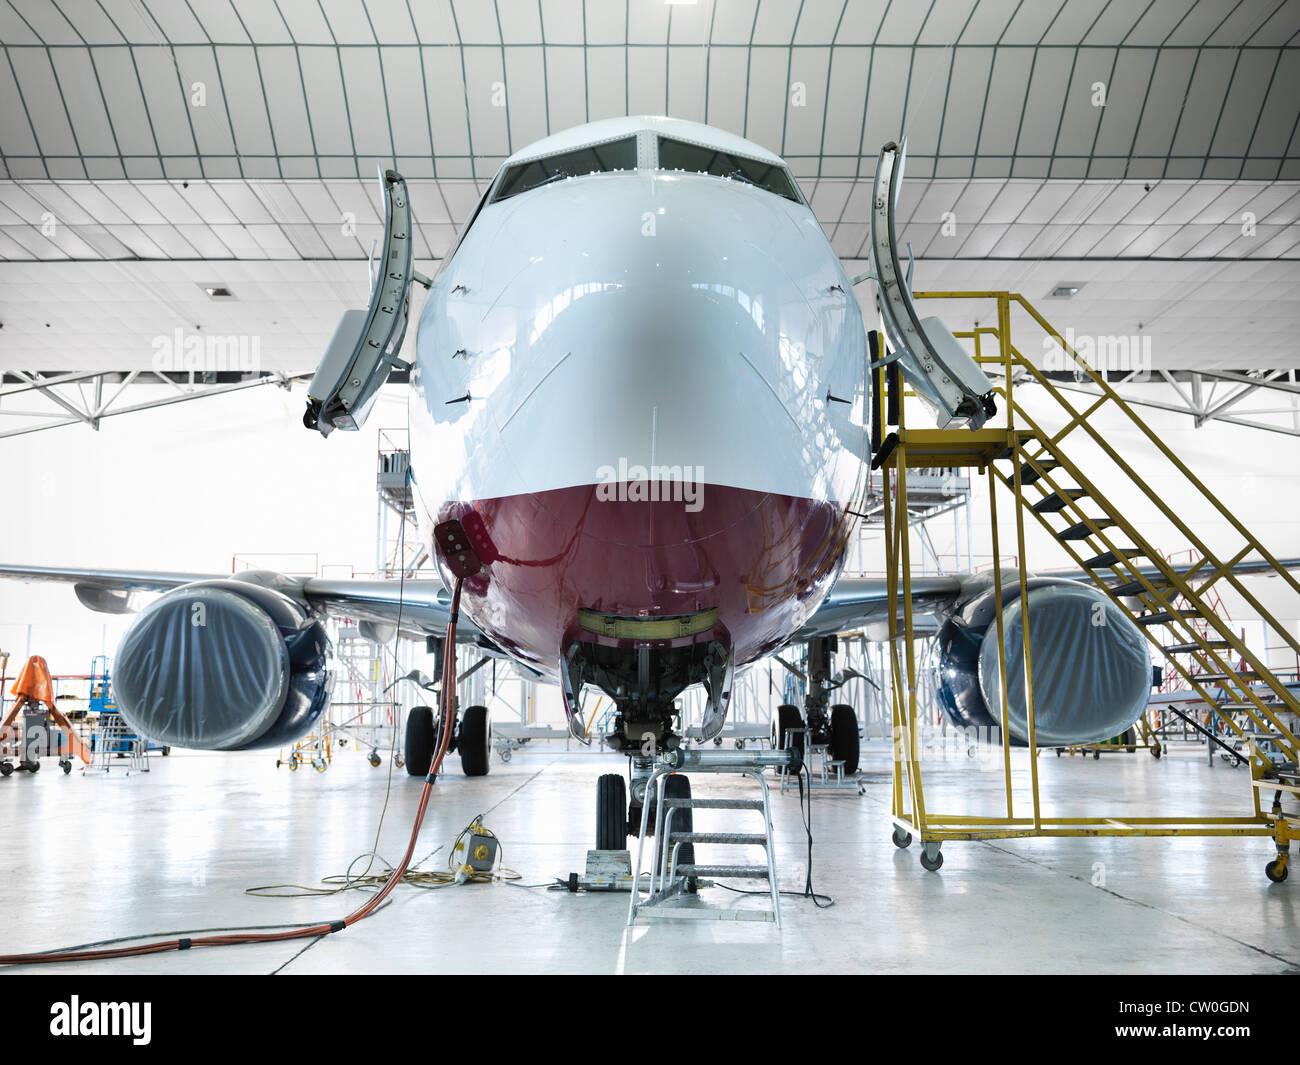 Flugzeug im Hangar angedockt Stockbild